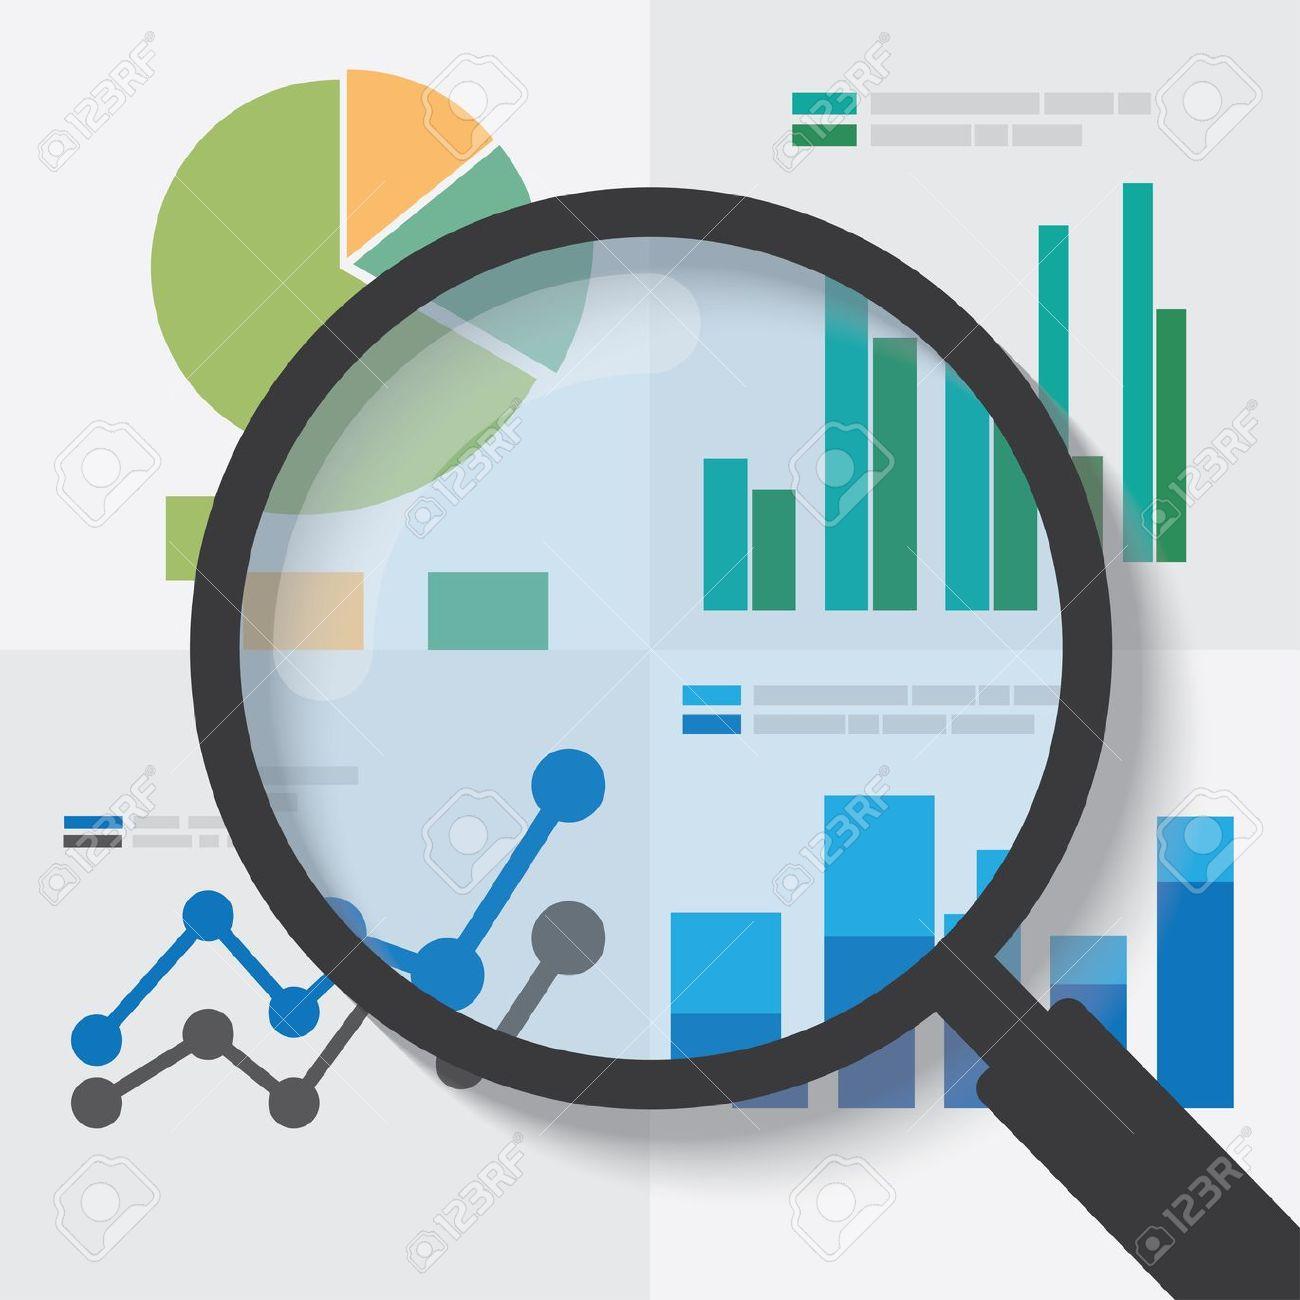 Data analysis clipart free.